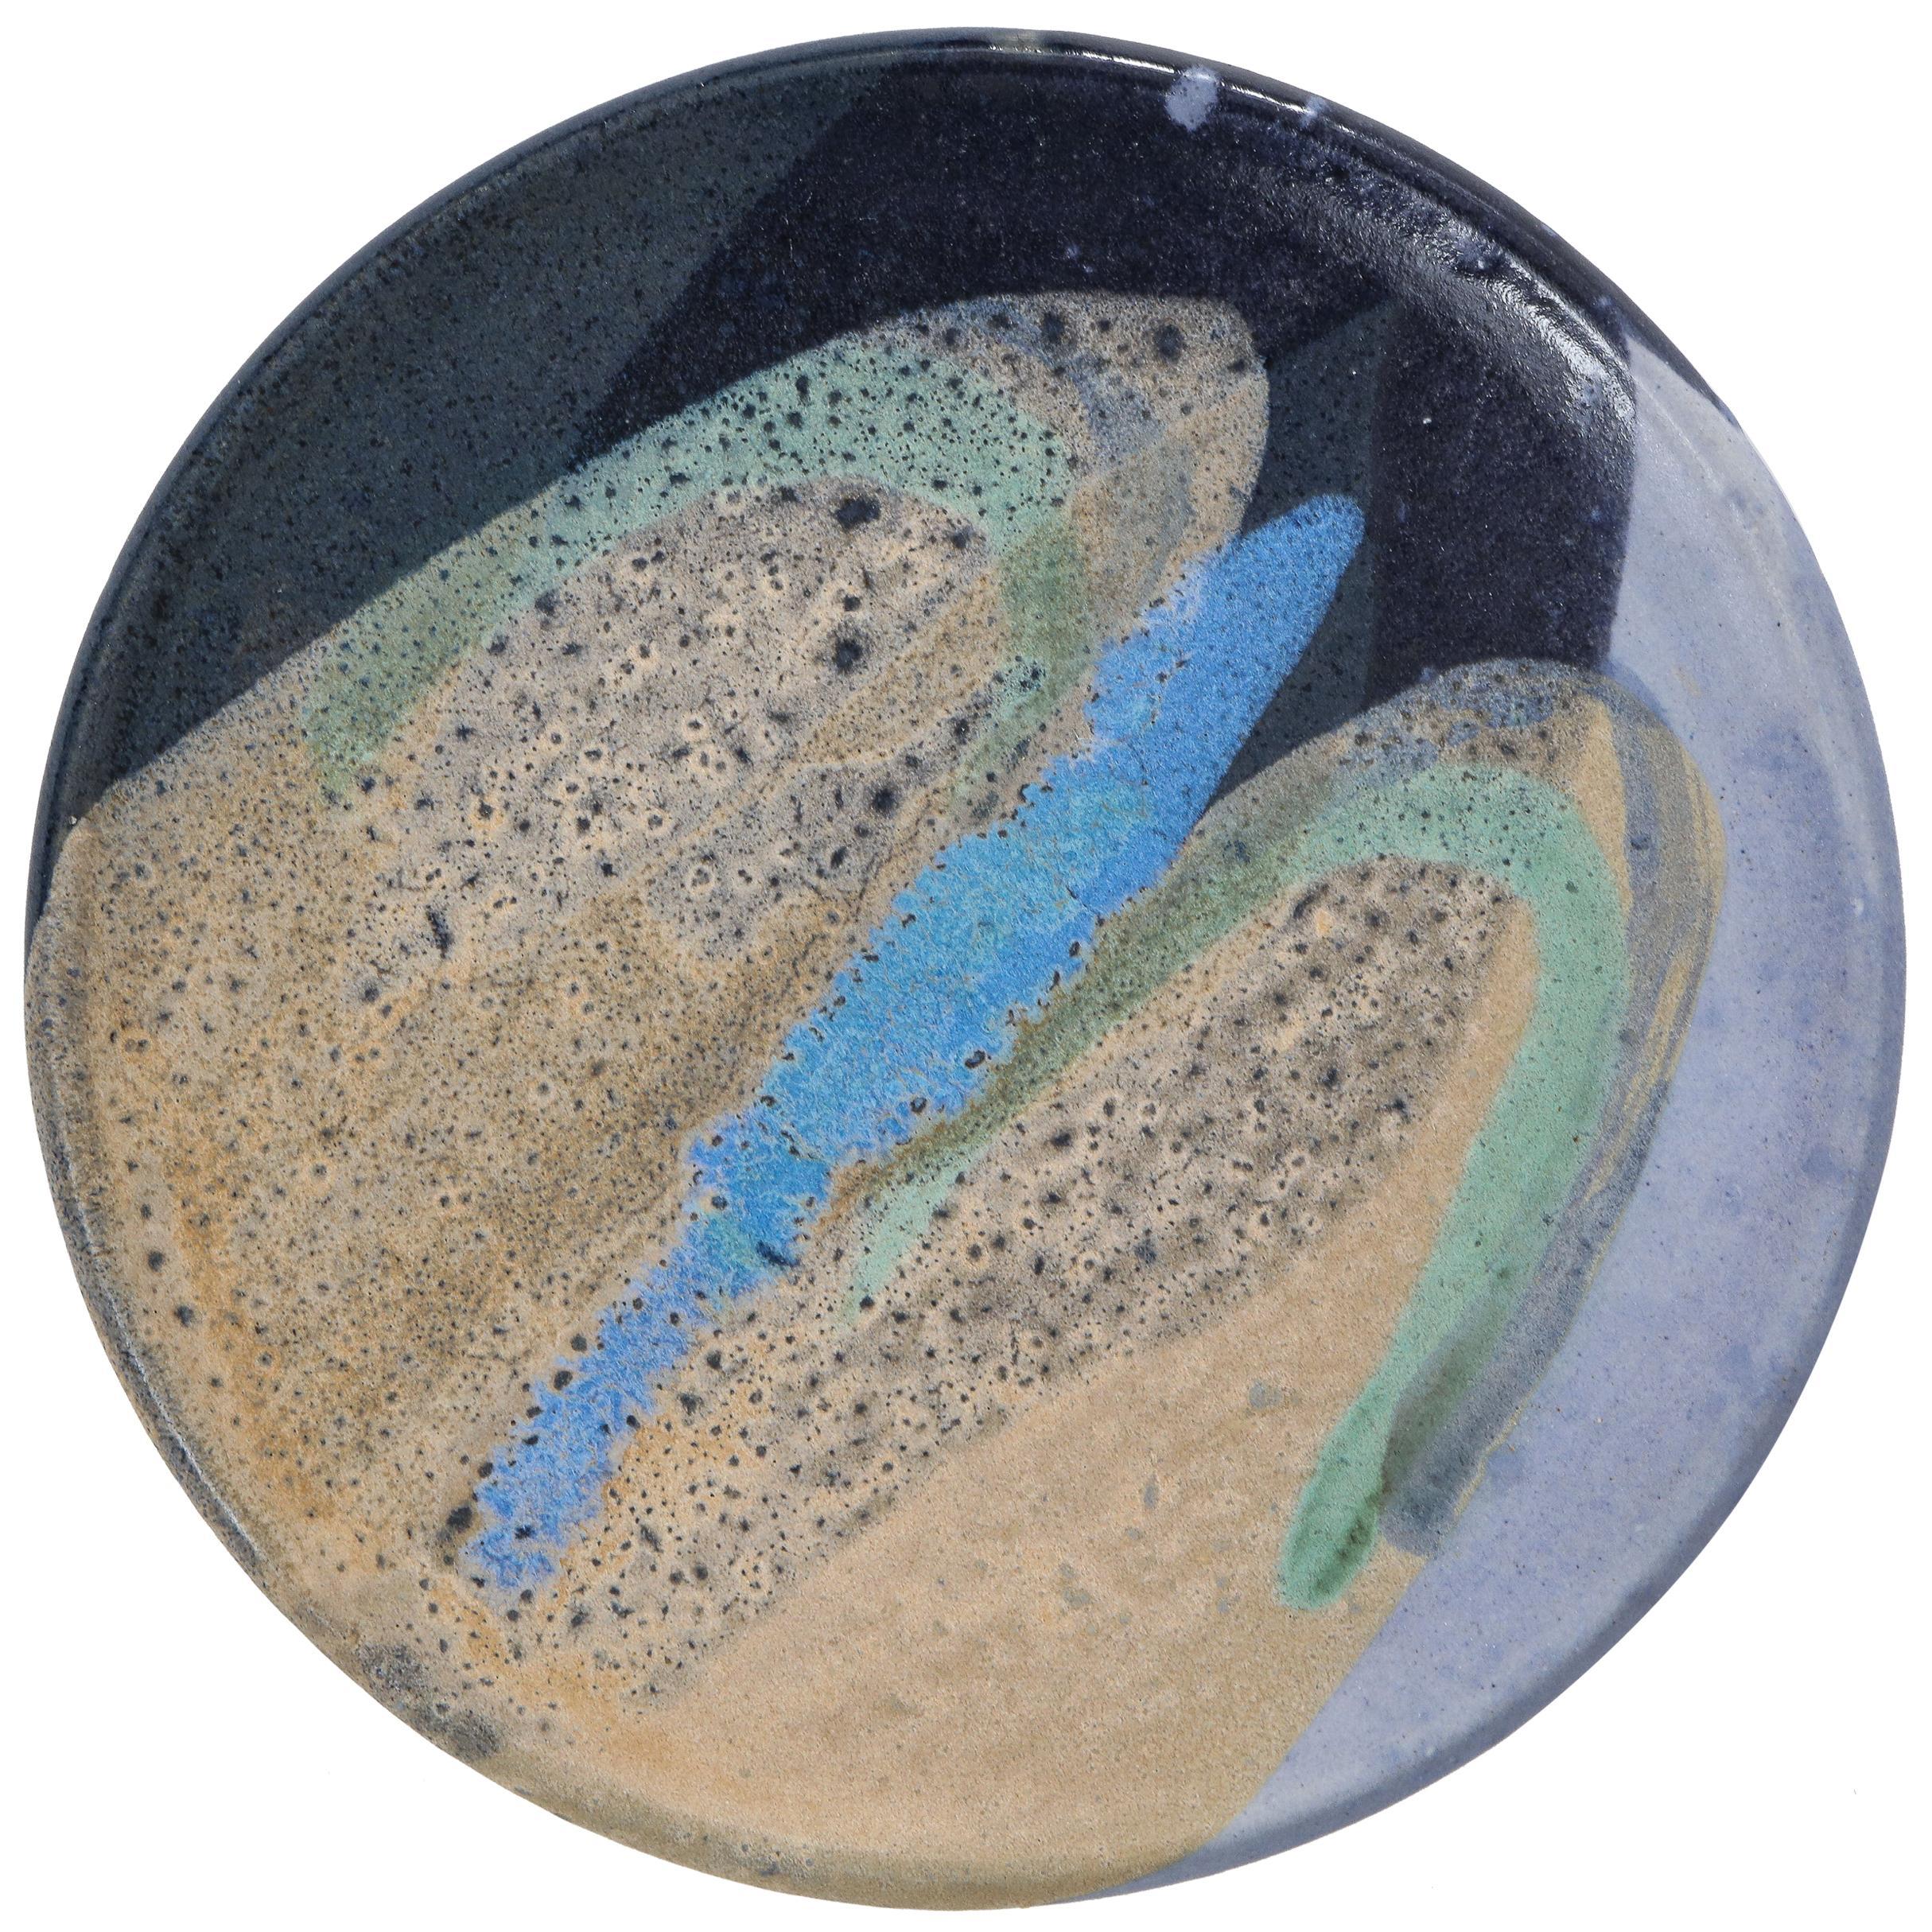 Ceramic Dish with Abstract Enamel Glaze